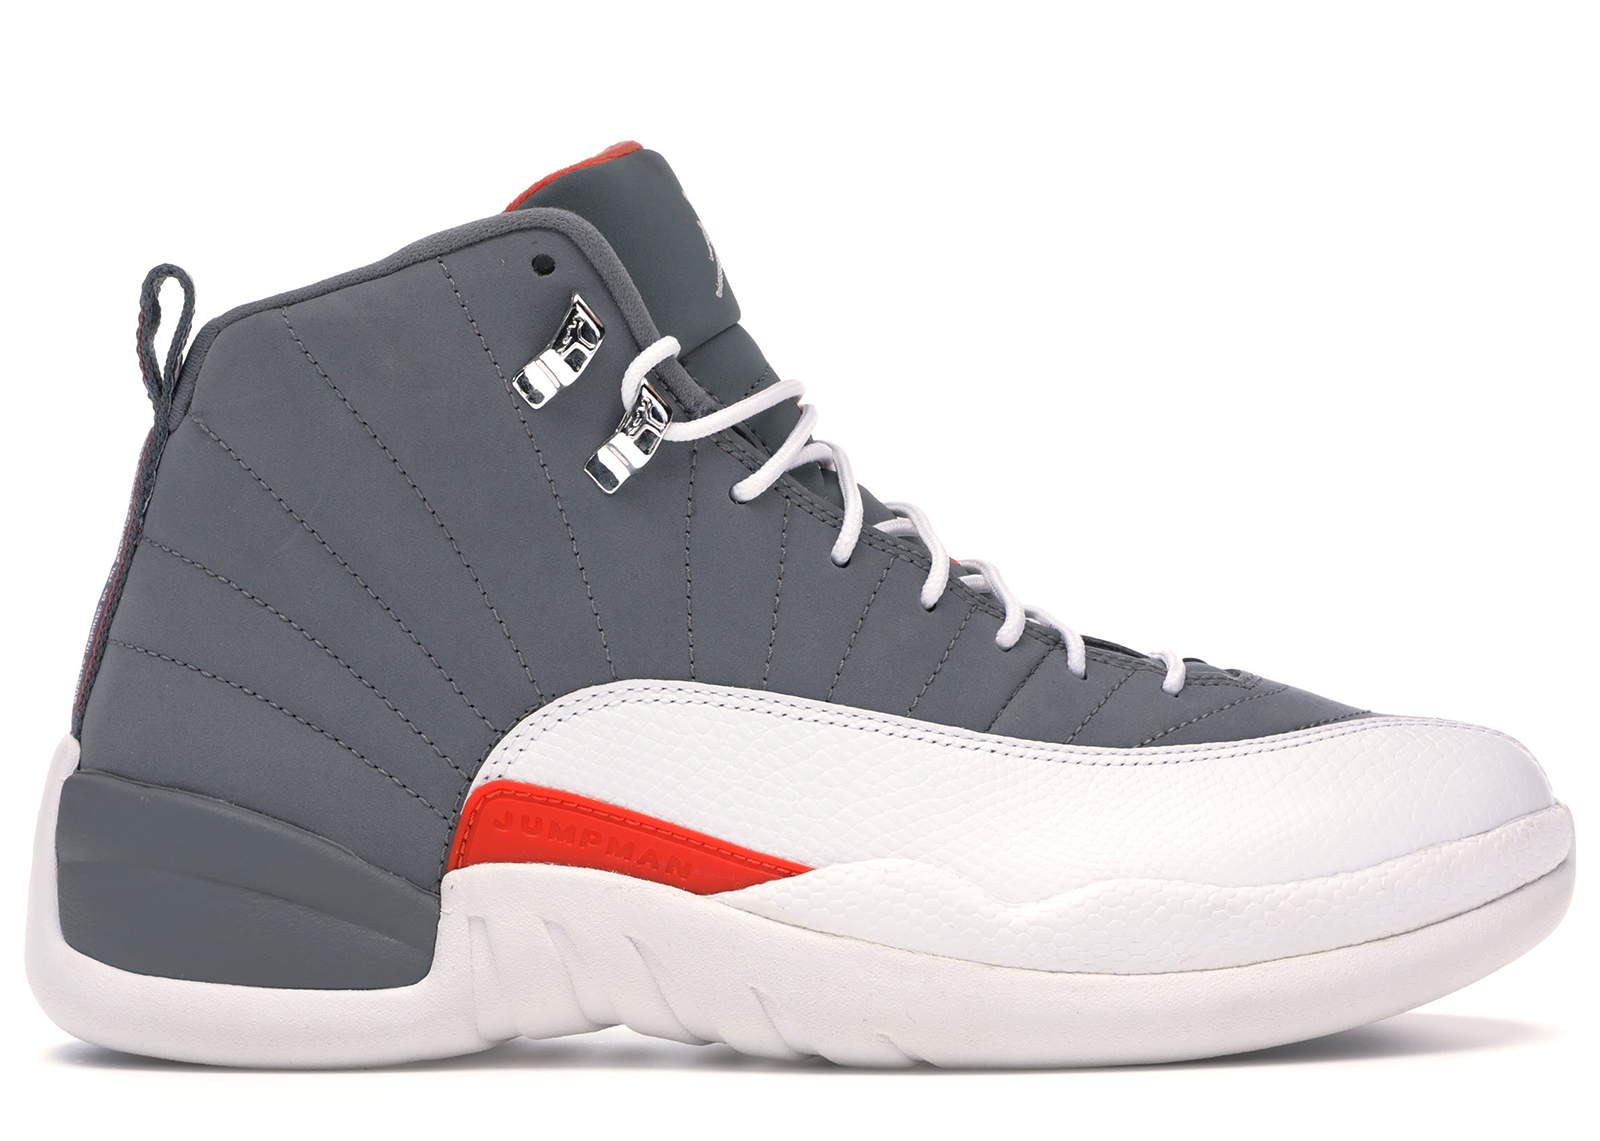 Jordan 12 Retro Cool Grey - 130690-012